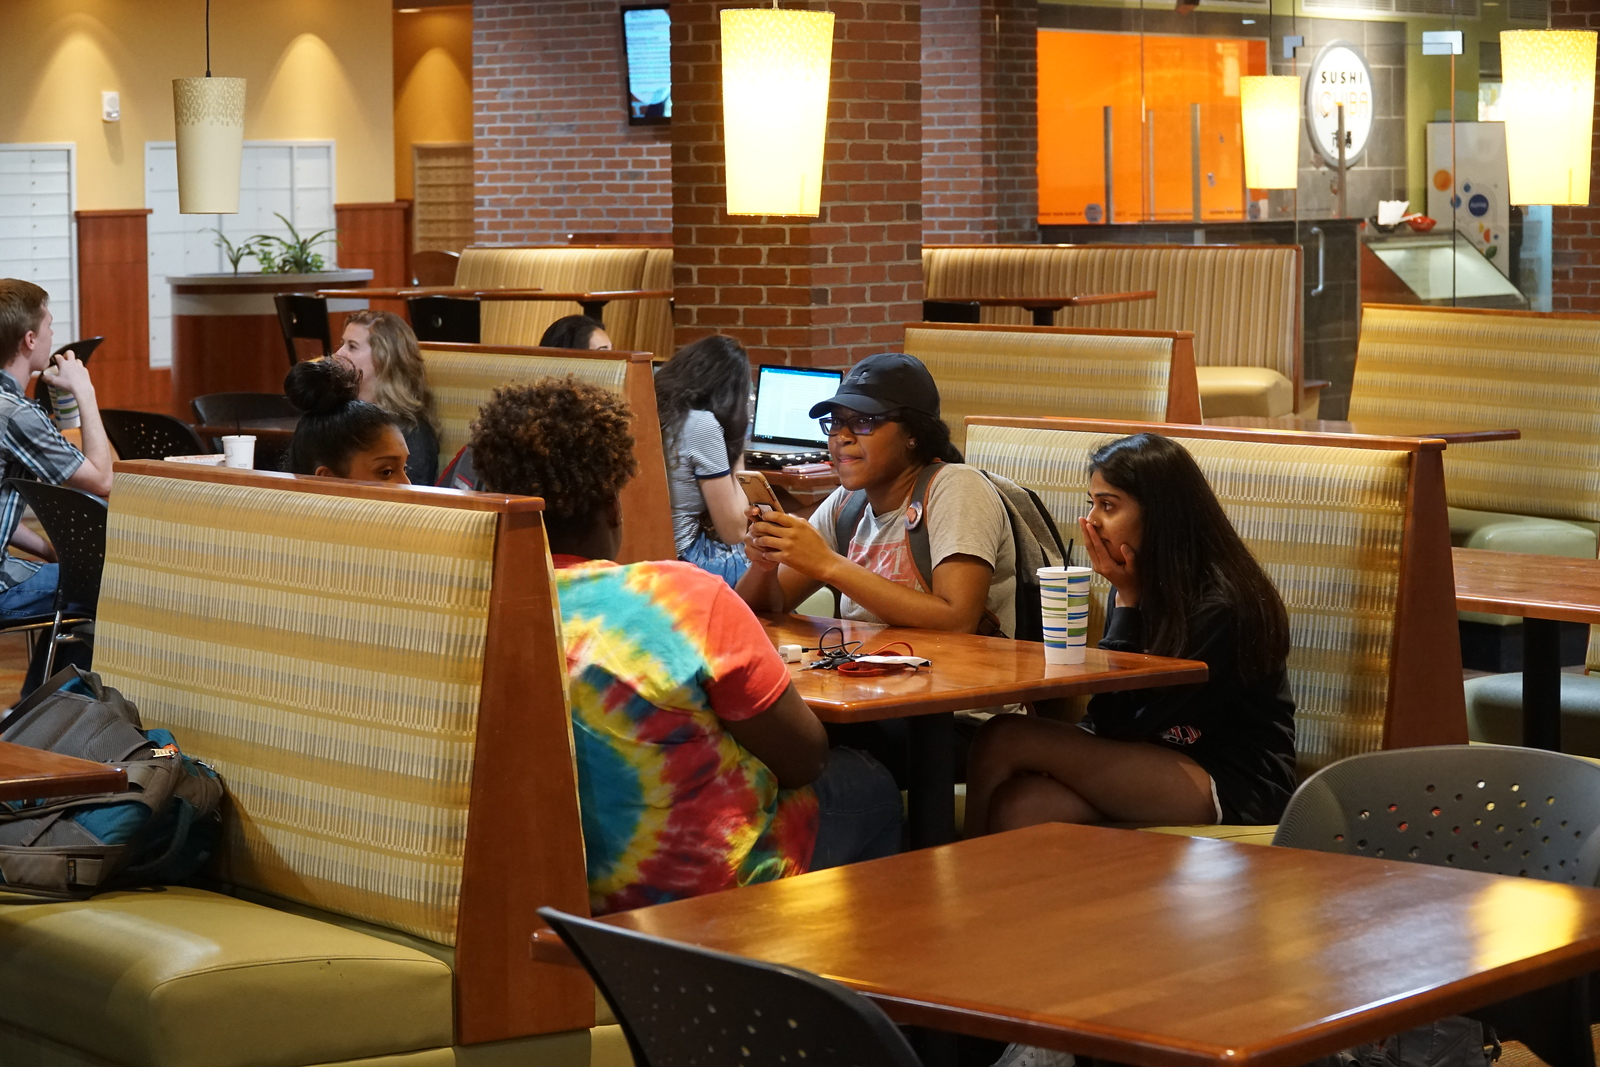 Ashley Keith, Jada Robbs, Jasmine Mohamed and Sapna Patel enjoying free time in Tucker Student Center.